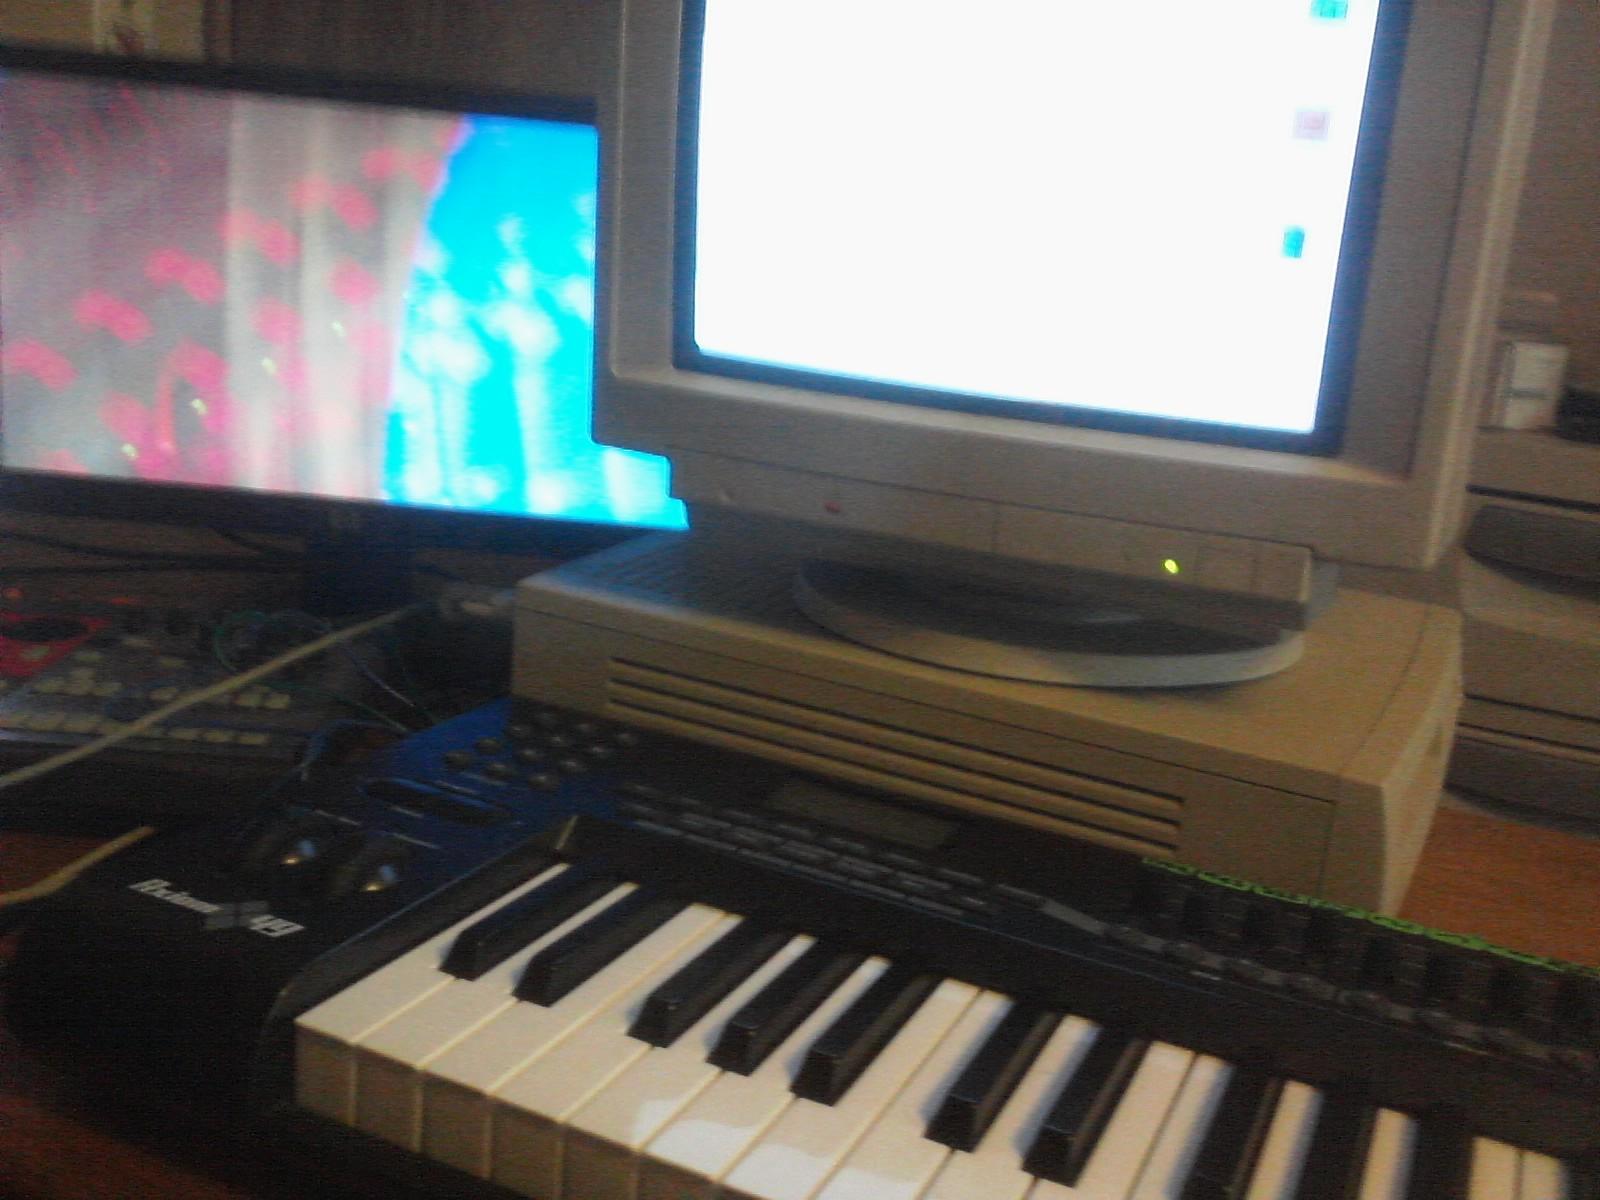 90's Mac Audio/midi software - Gearslutz